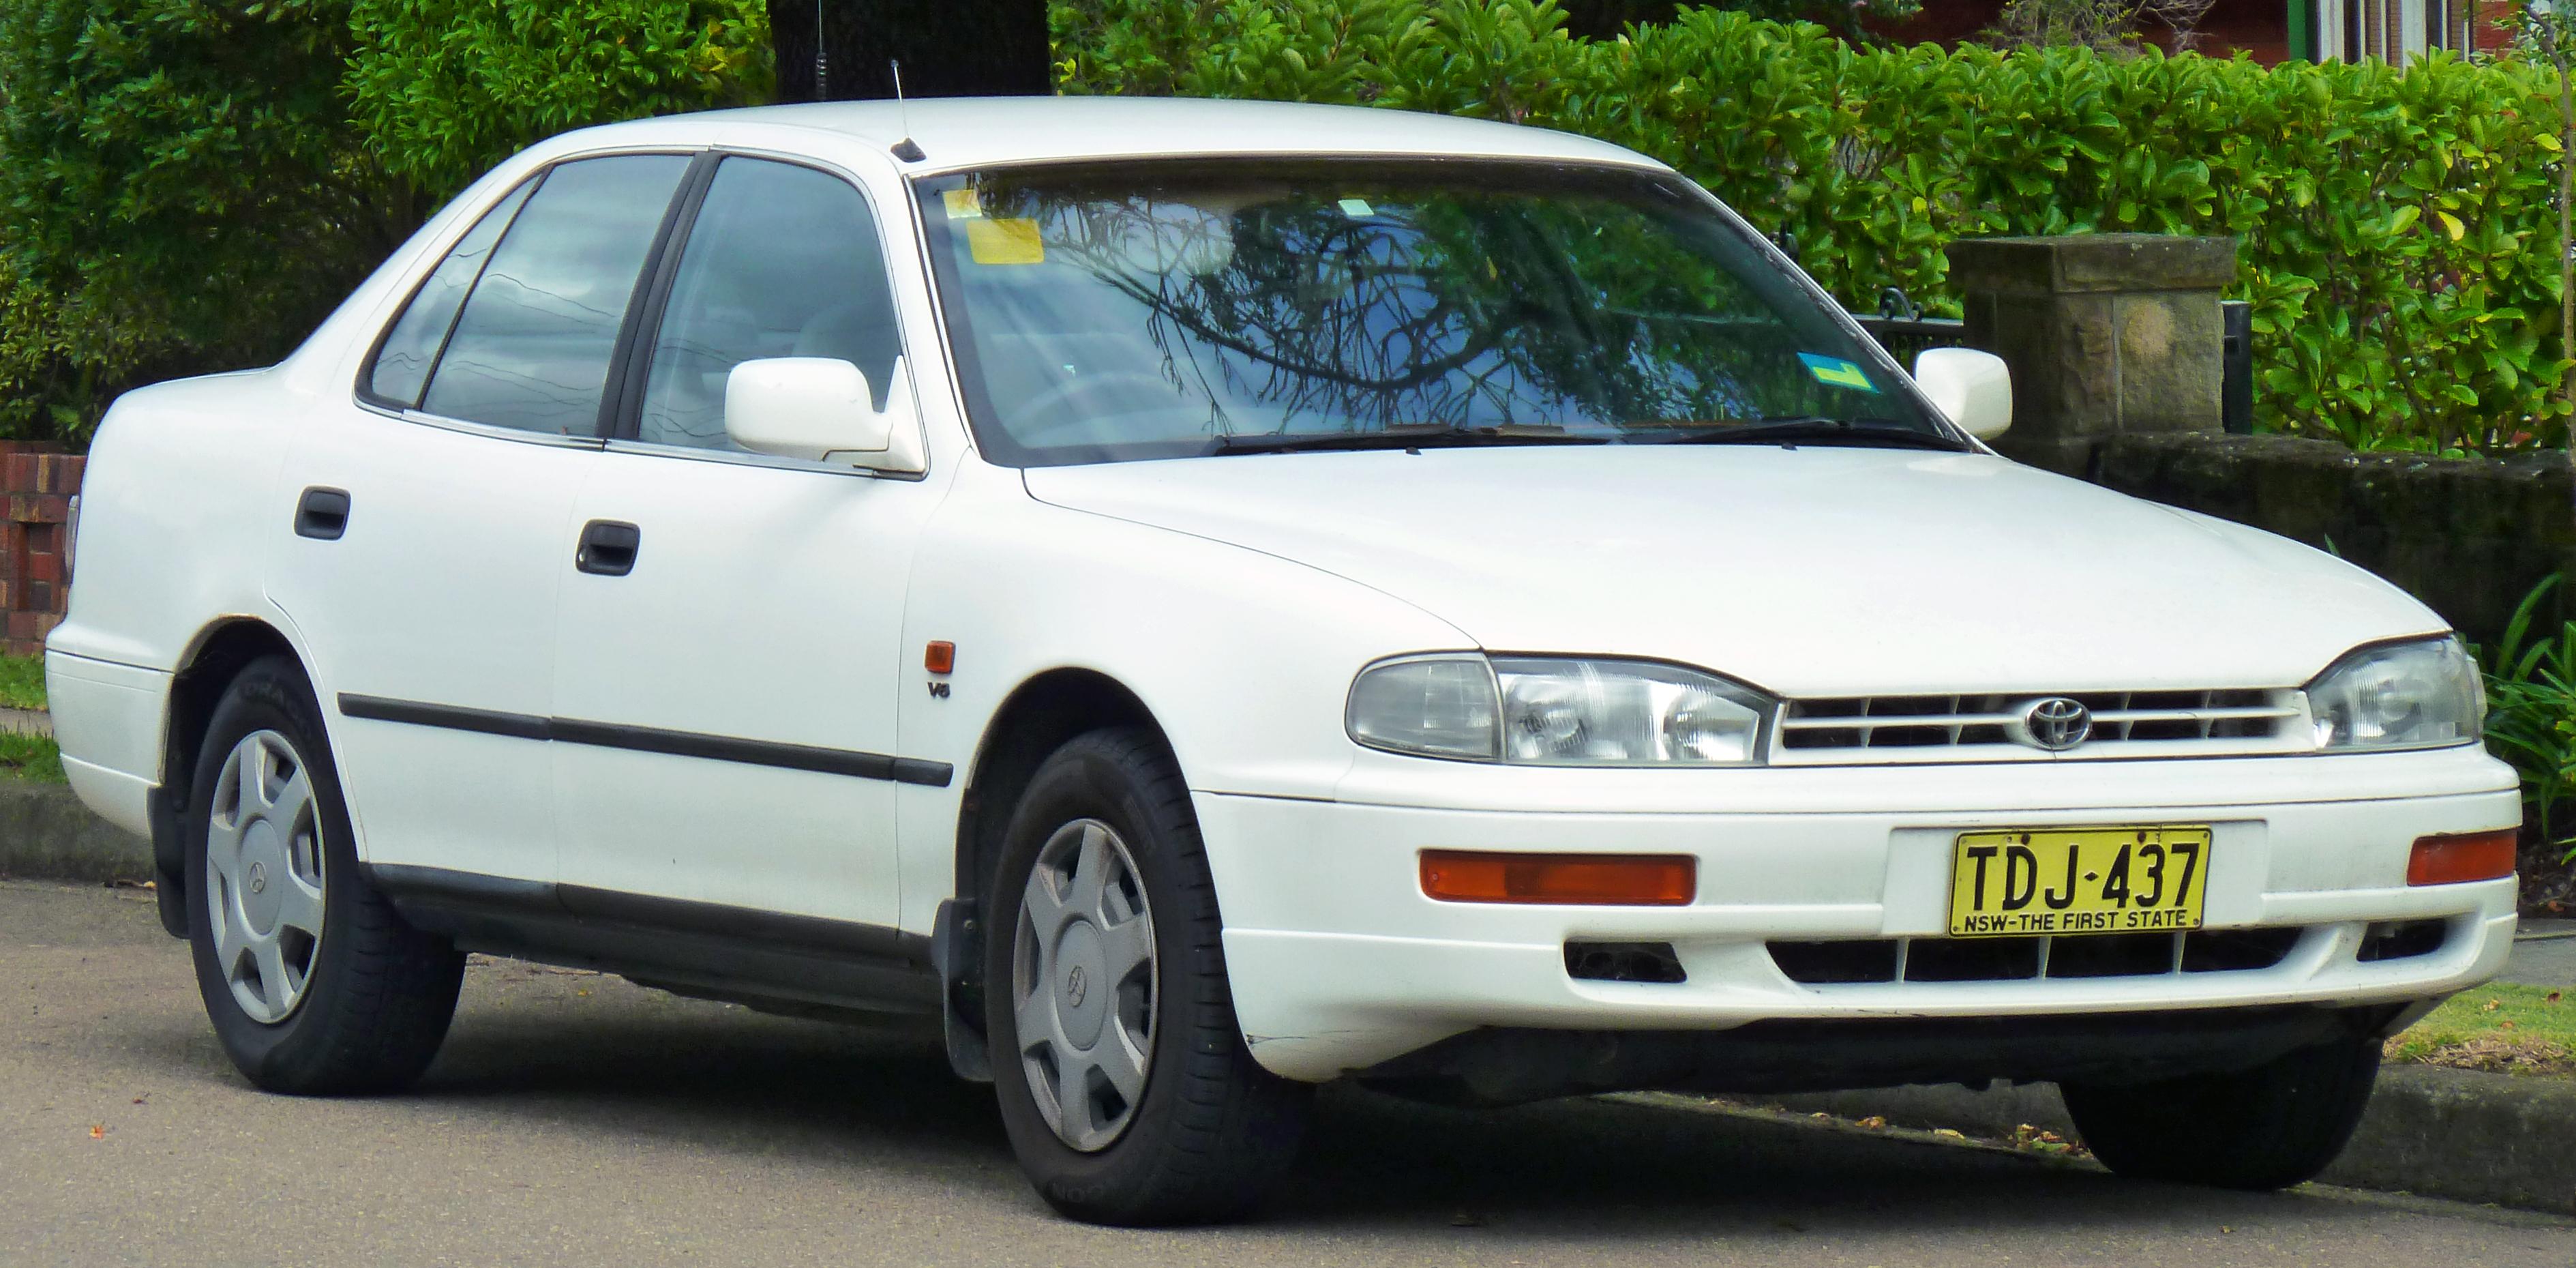 1995 Toyota Camry